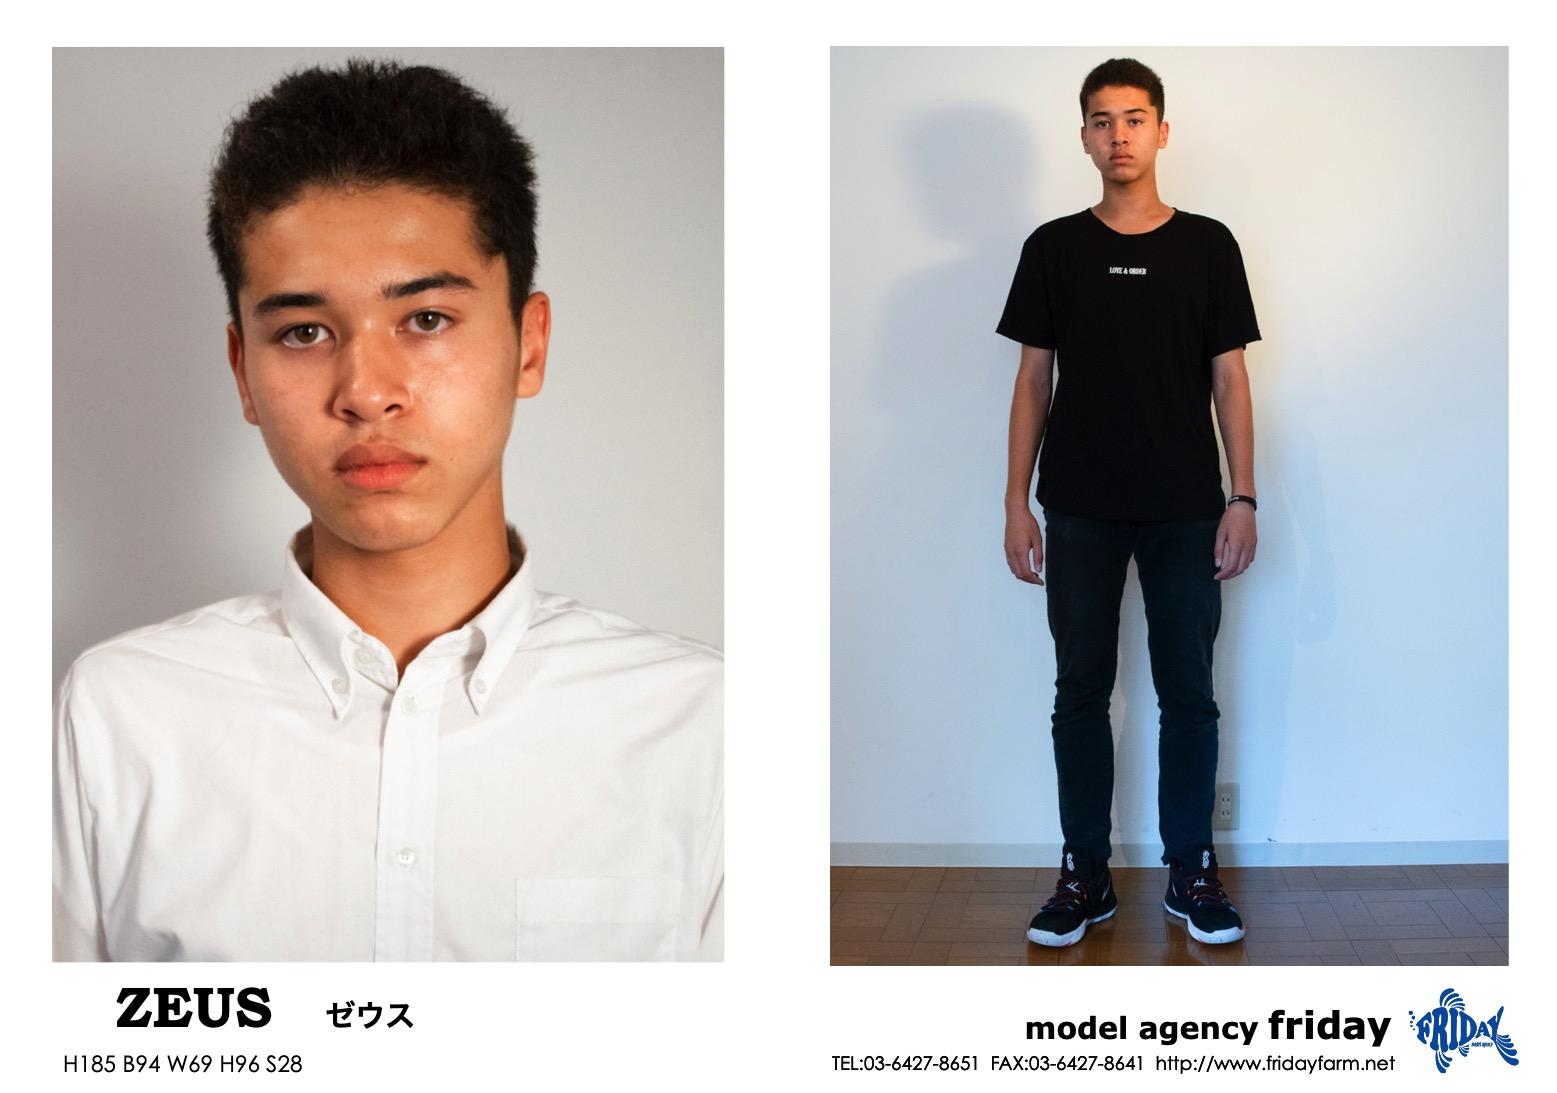 Zeus - ゼウス | model agency friday